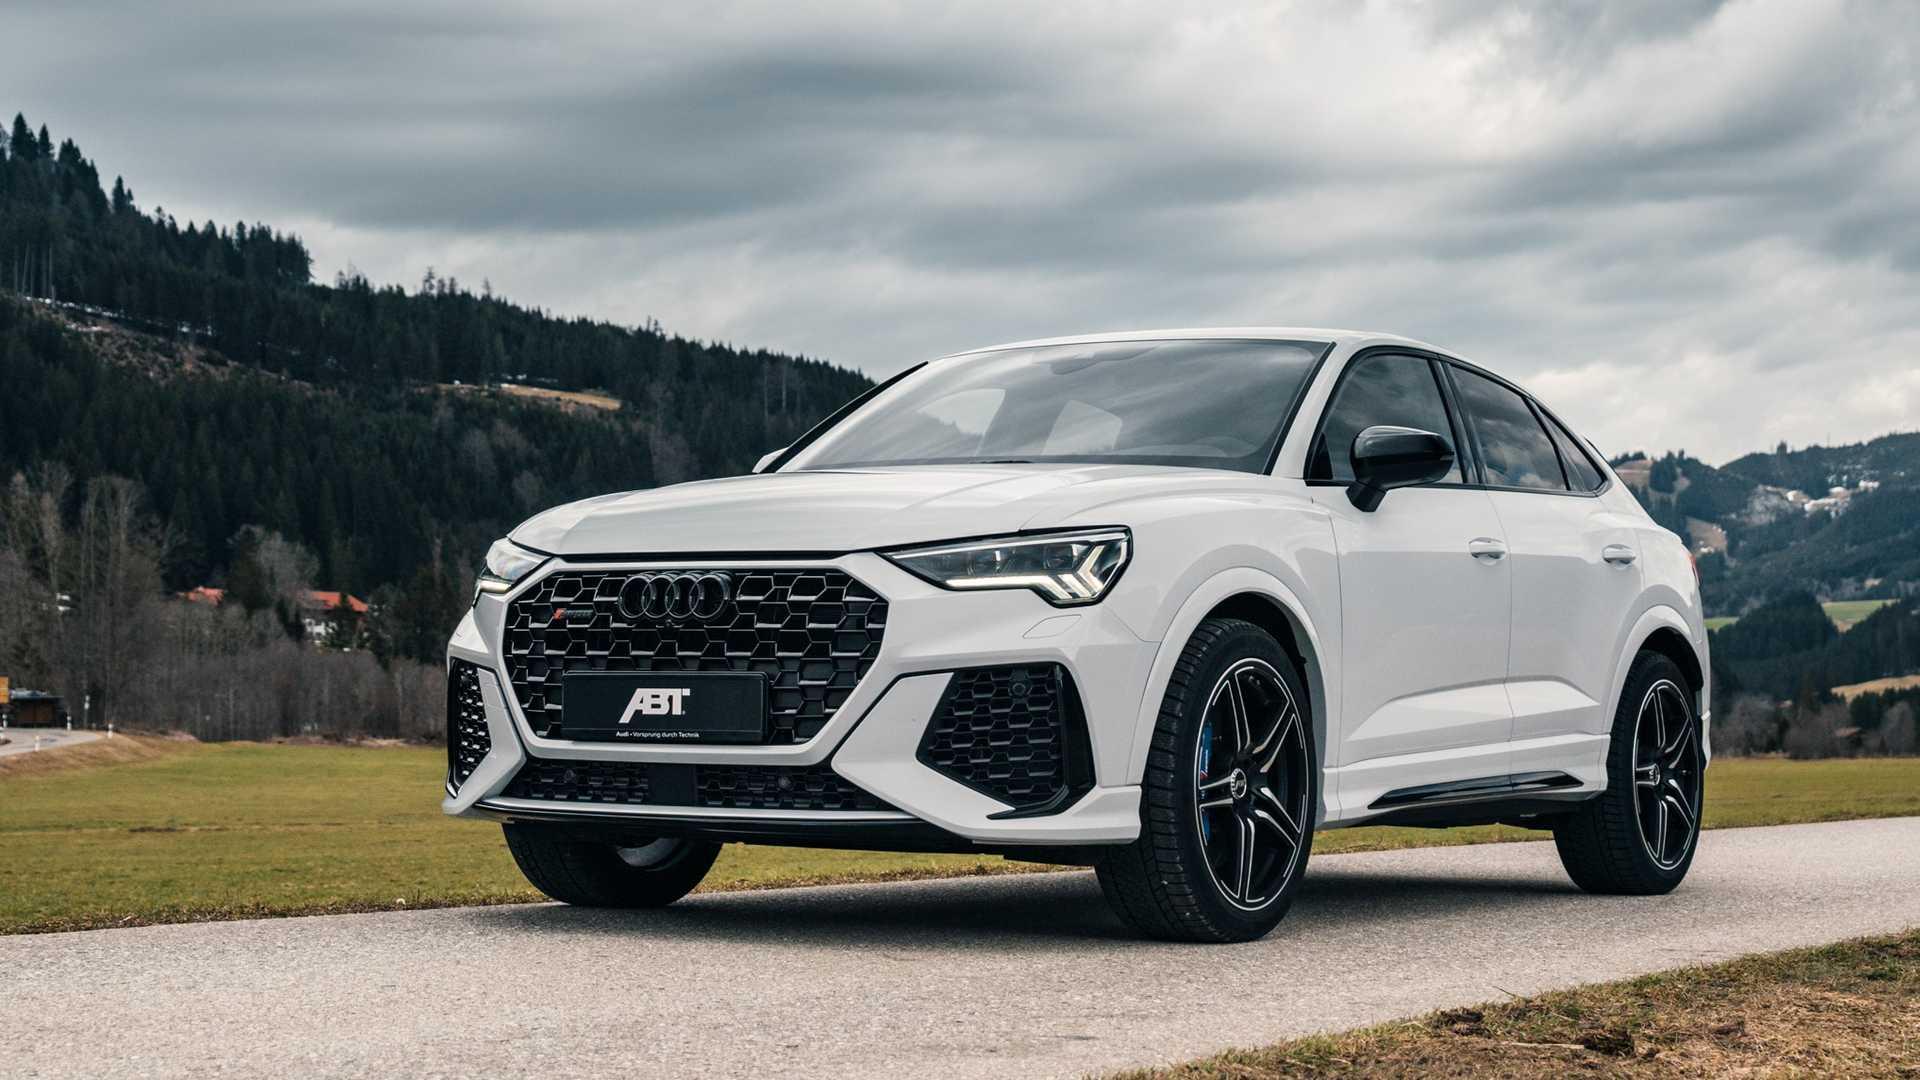 Abt Works Its Magic On Audi S Untamed Rs Q3 Sportback Autoevolution